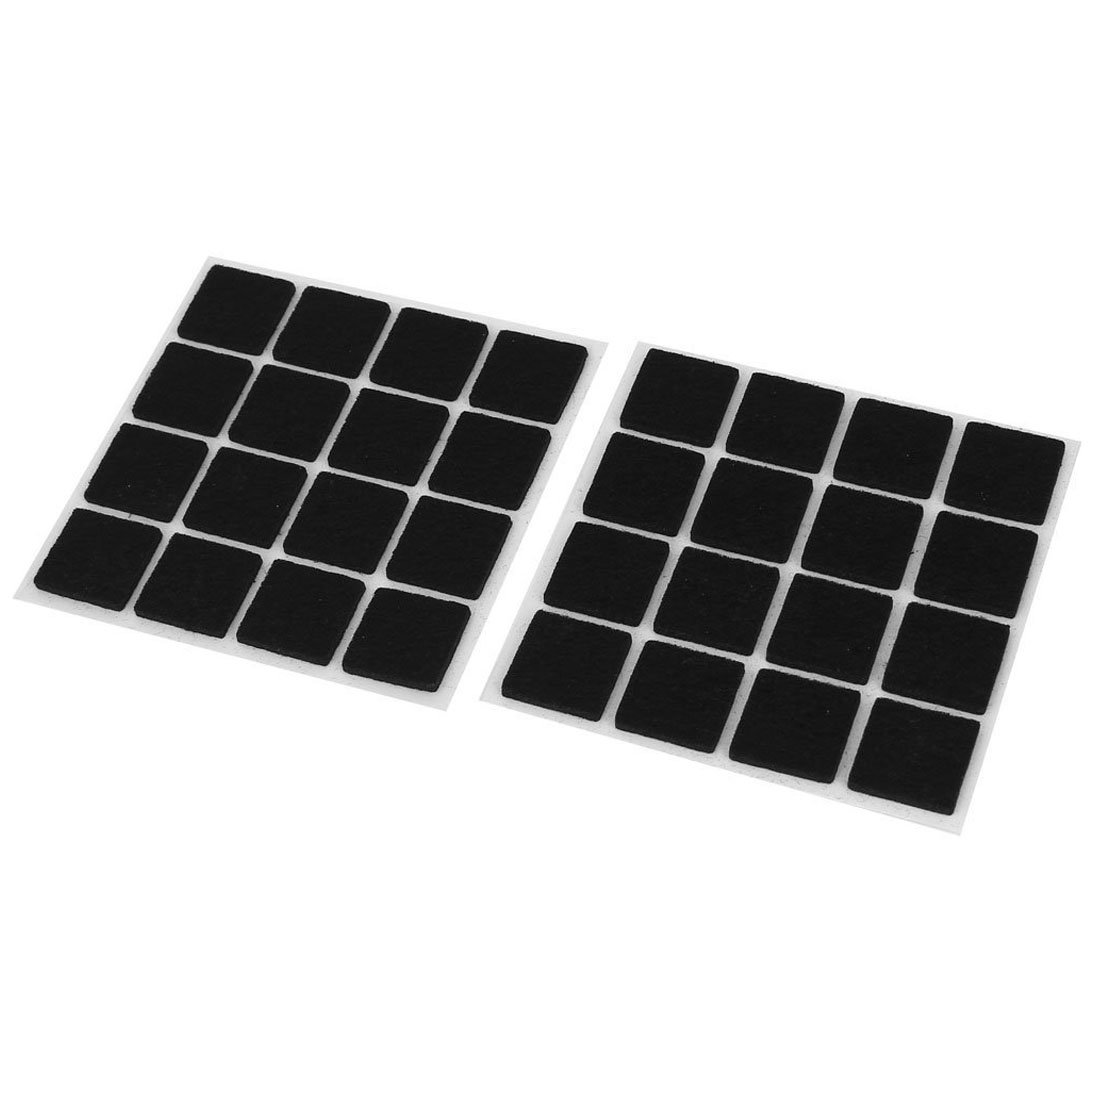 PHFU Self Adhesive Floor Protectors Furniture Felt Square Pads 32pcsPHFU Self Adhesive Floor Protectors Furniture Felt Square Pads 32pcs